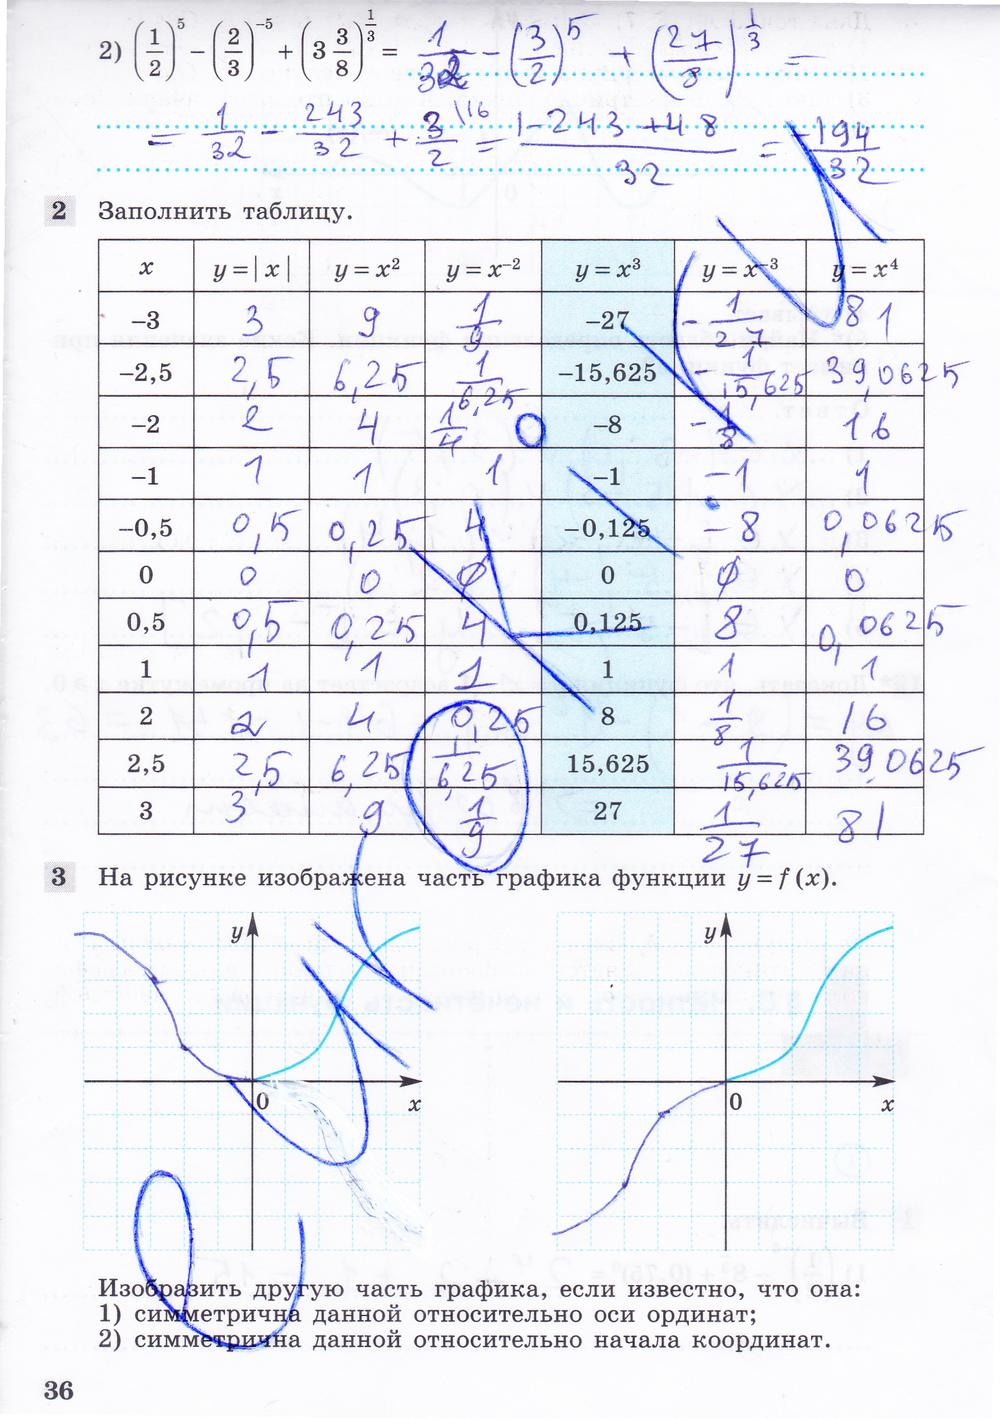 Гдз По Алгебре 9 Класс Колягин Ткачёва Федорова Шабунин